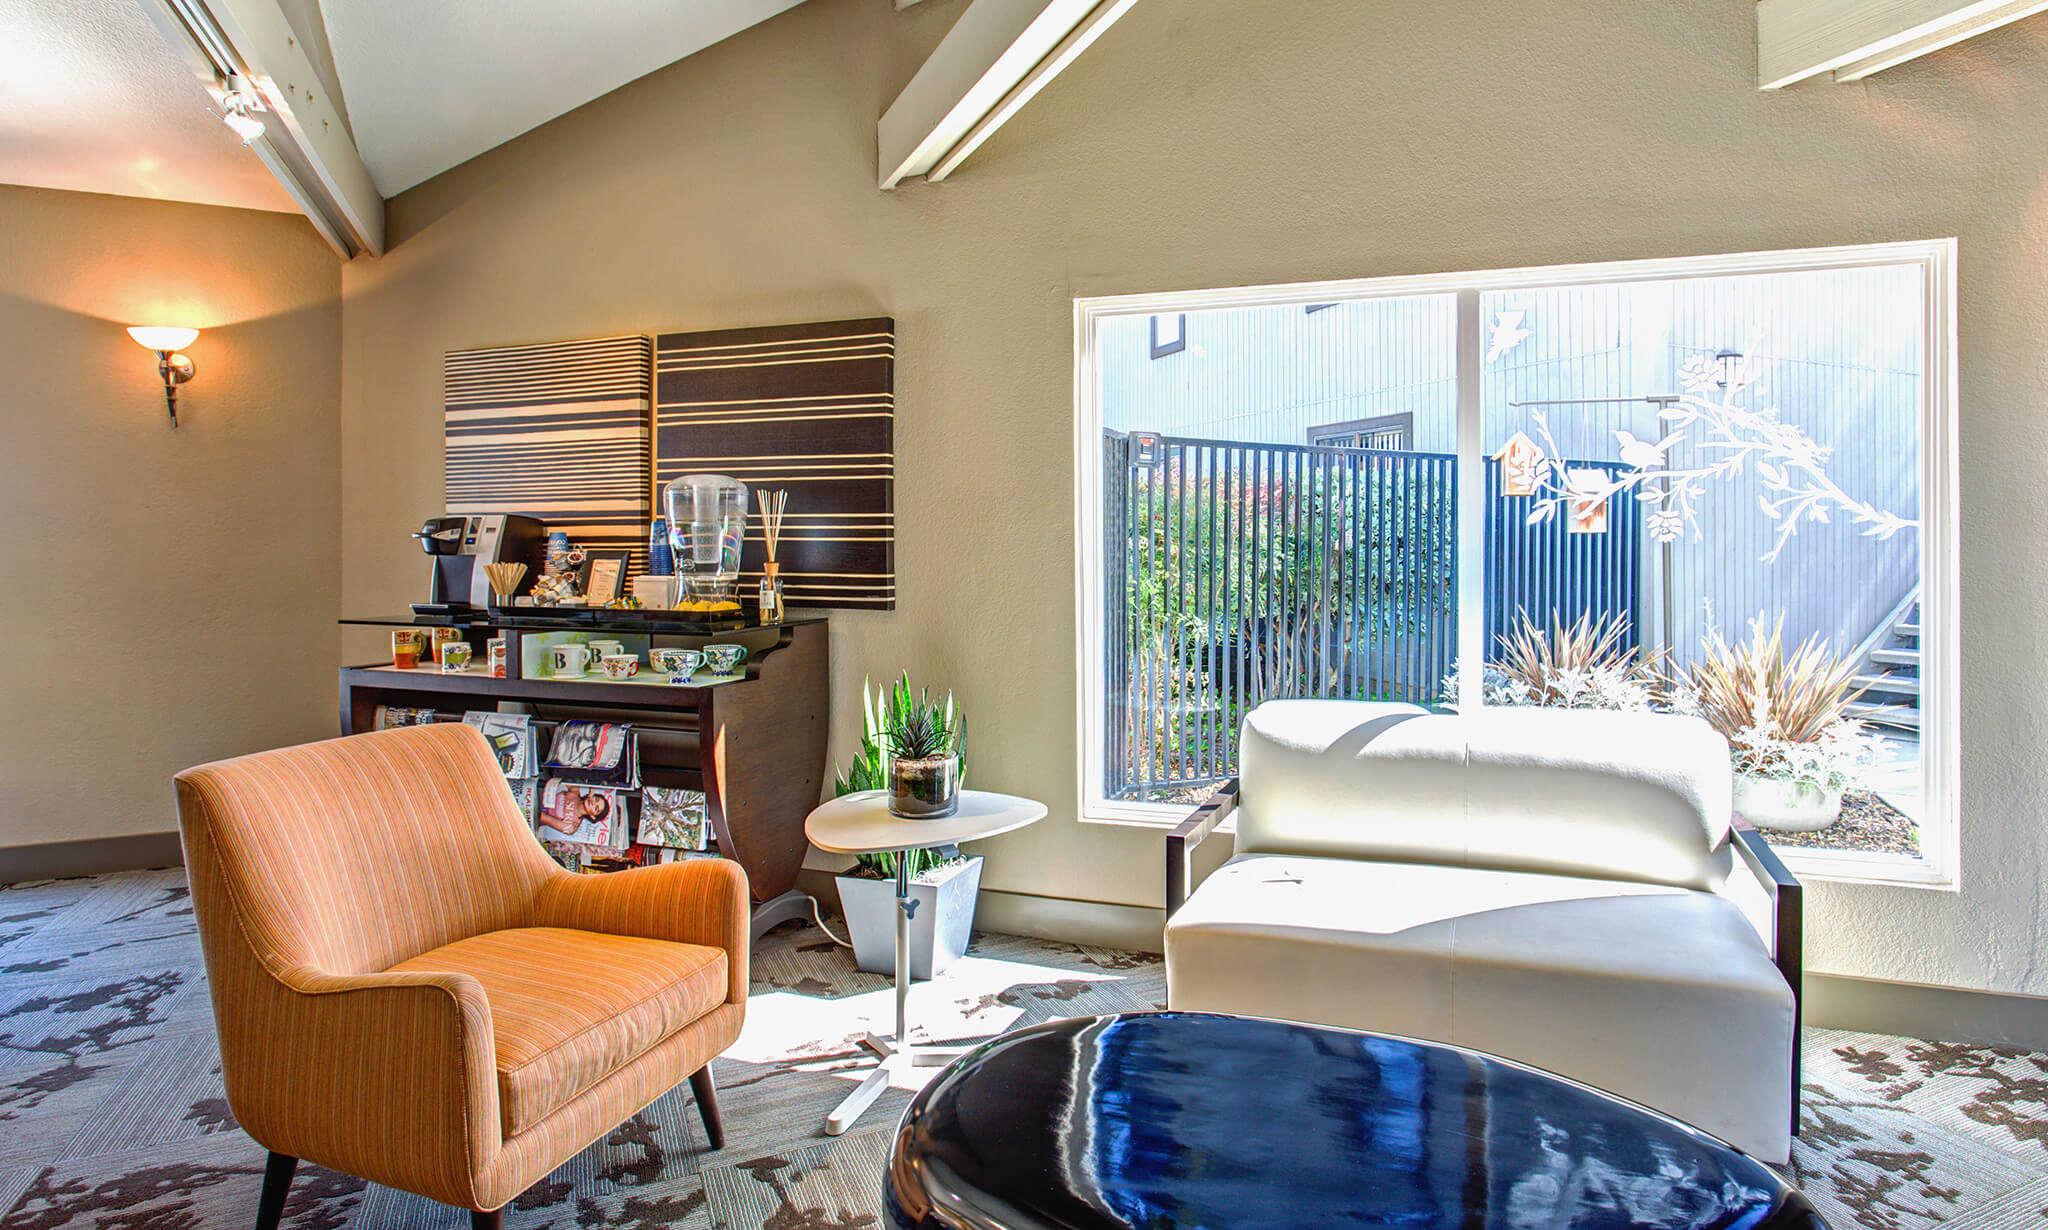 Boardwalk Apartments apartments in Santa Clara CA to rent photo 4